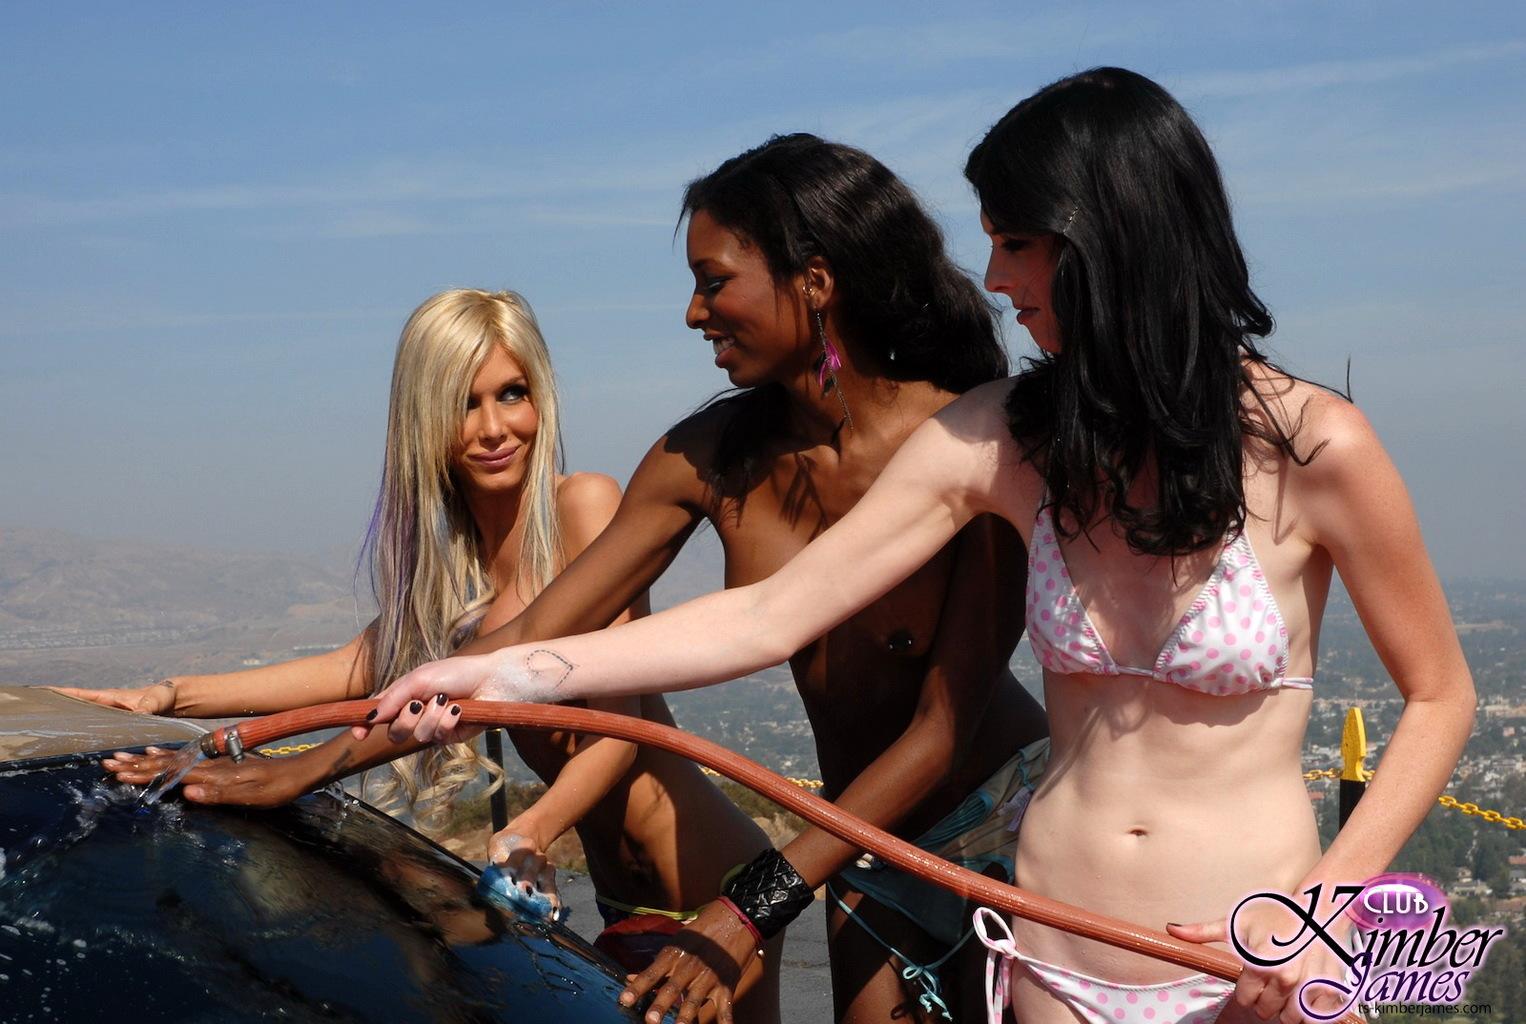 Nice Hottie Kimber James In Inviting Carwash Photoshoot